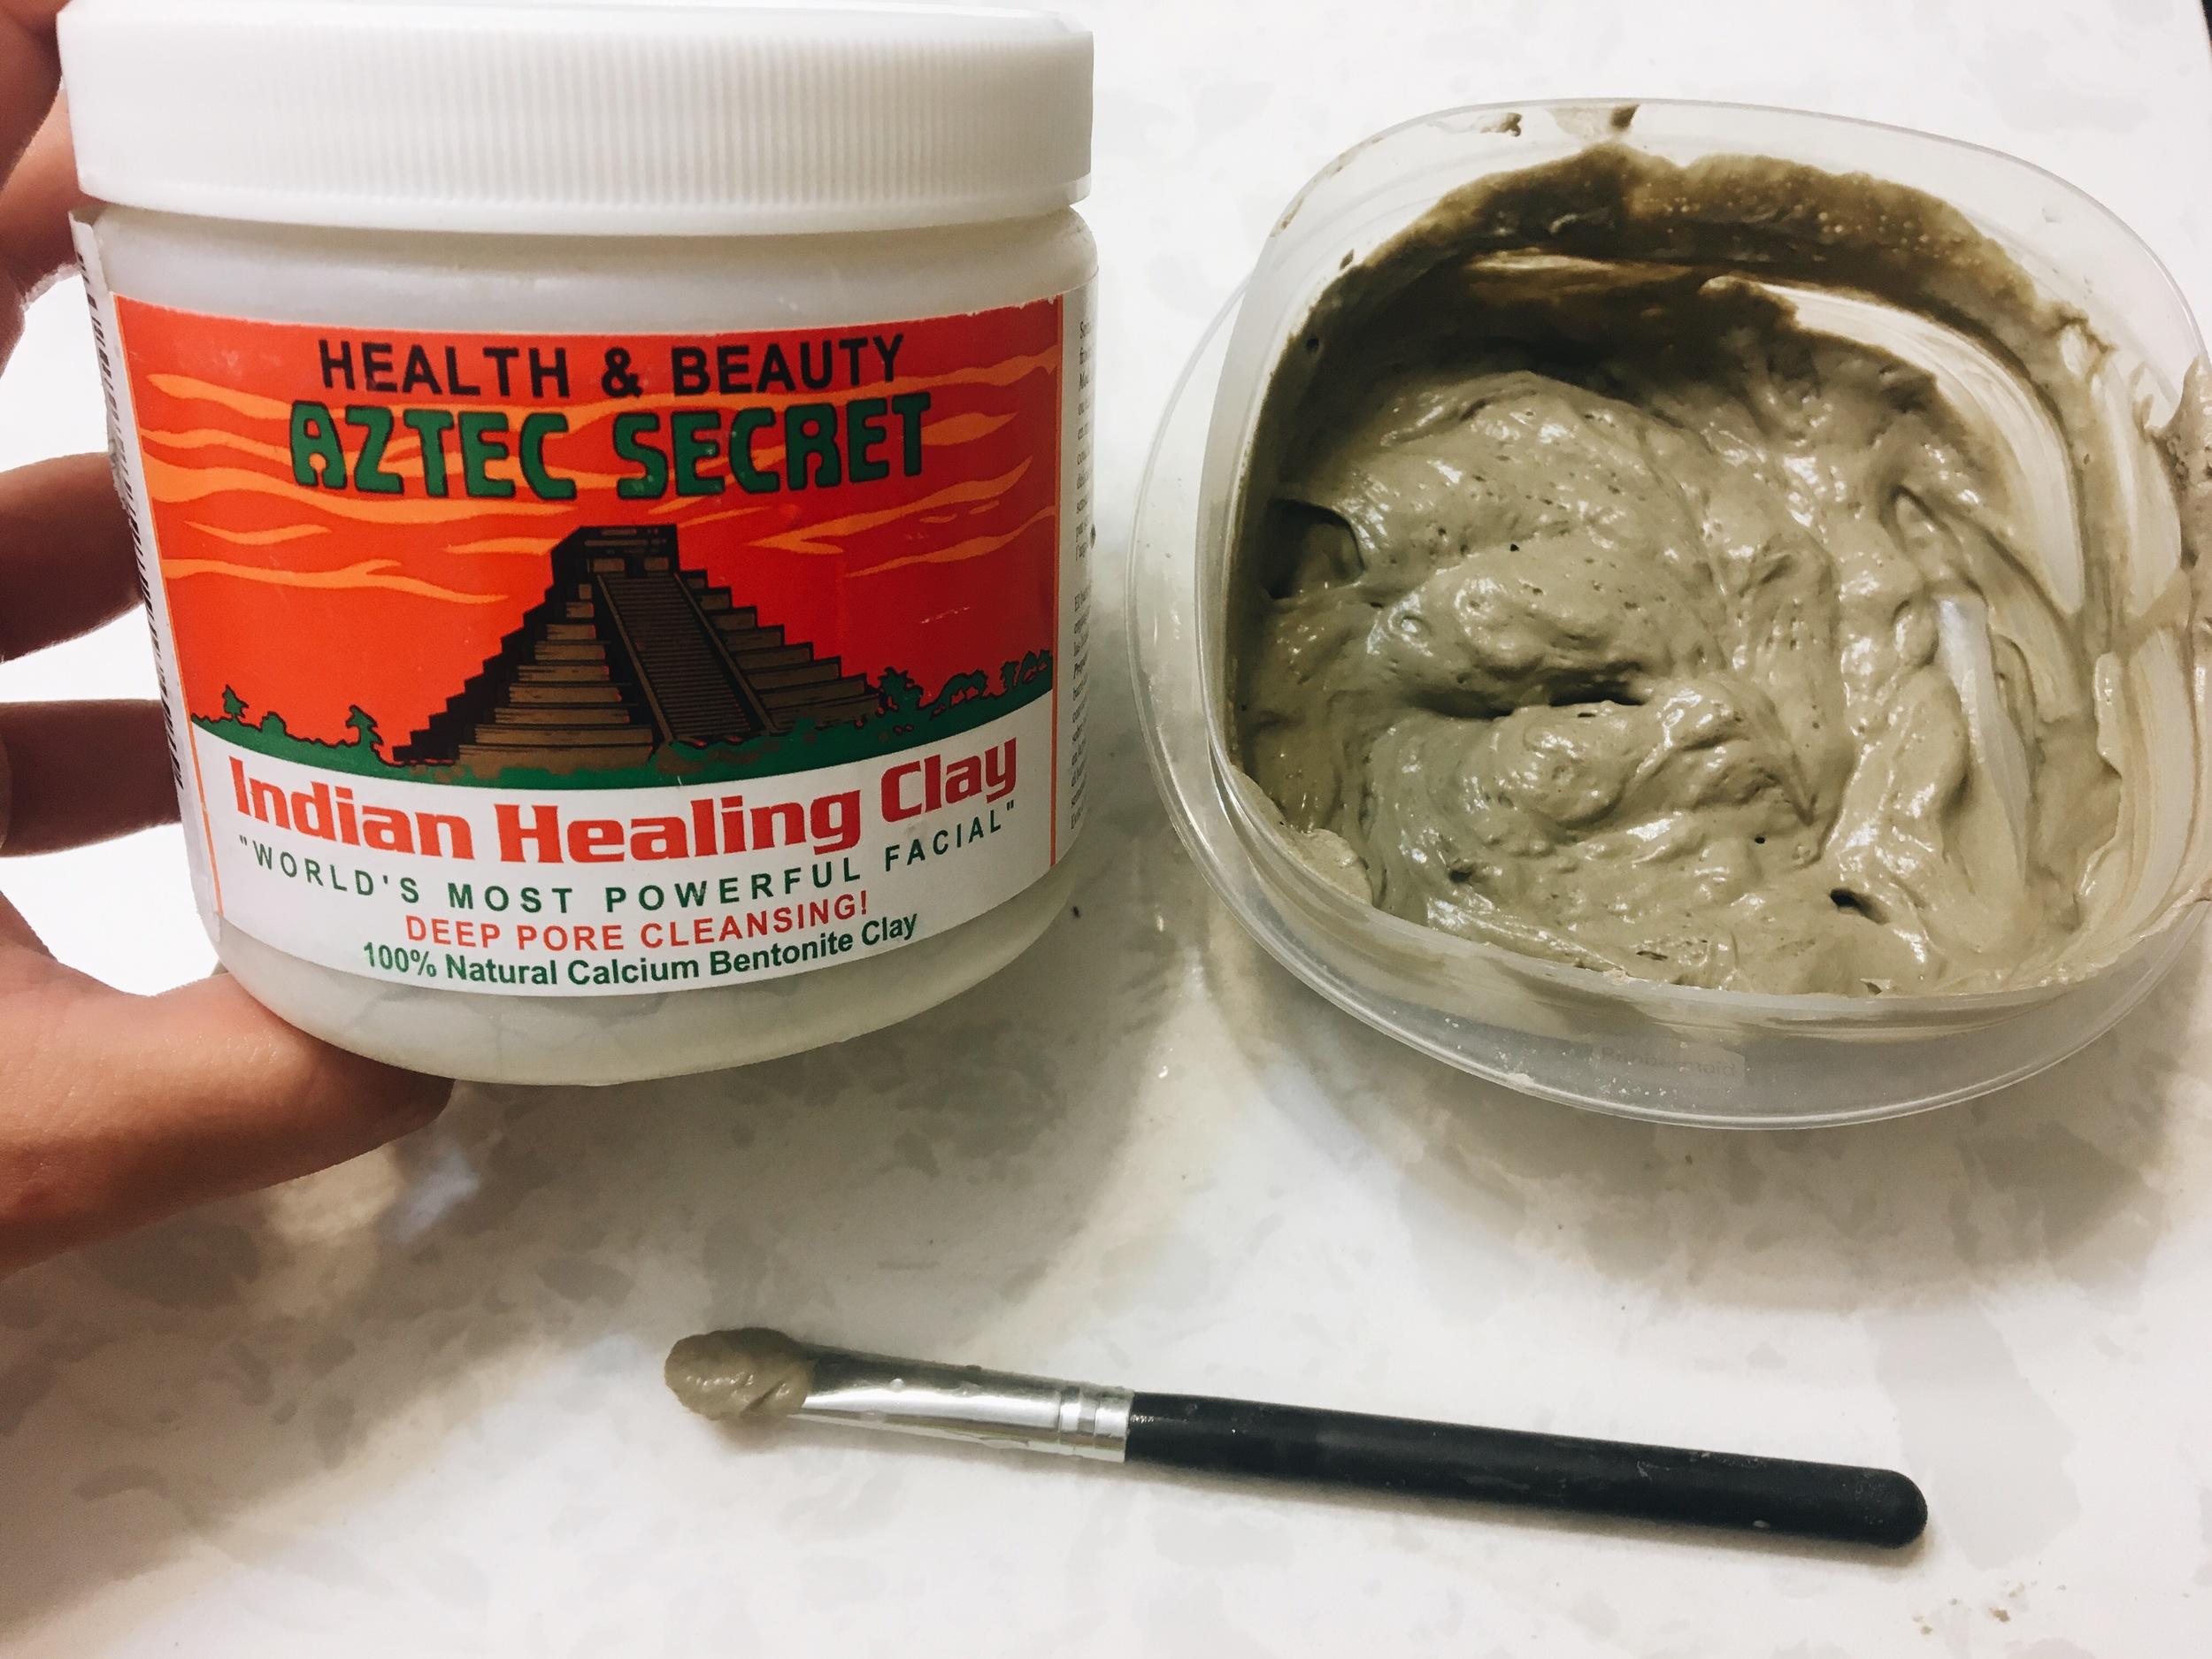 Health & Beauty Aztec Secret - Indian Healing Clay - 100% Natural Calcium Bentonite Clay